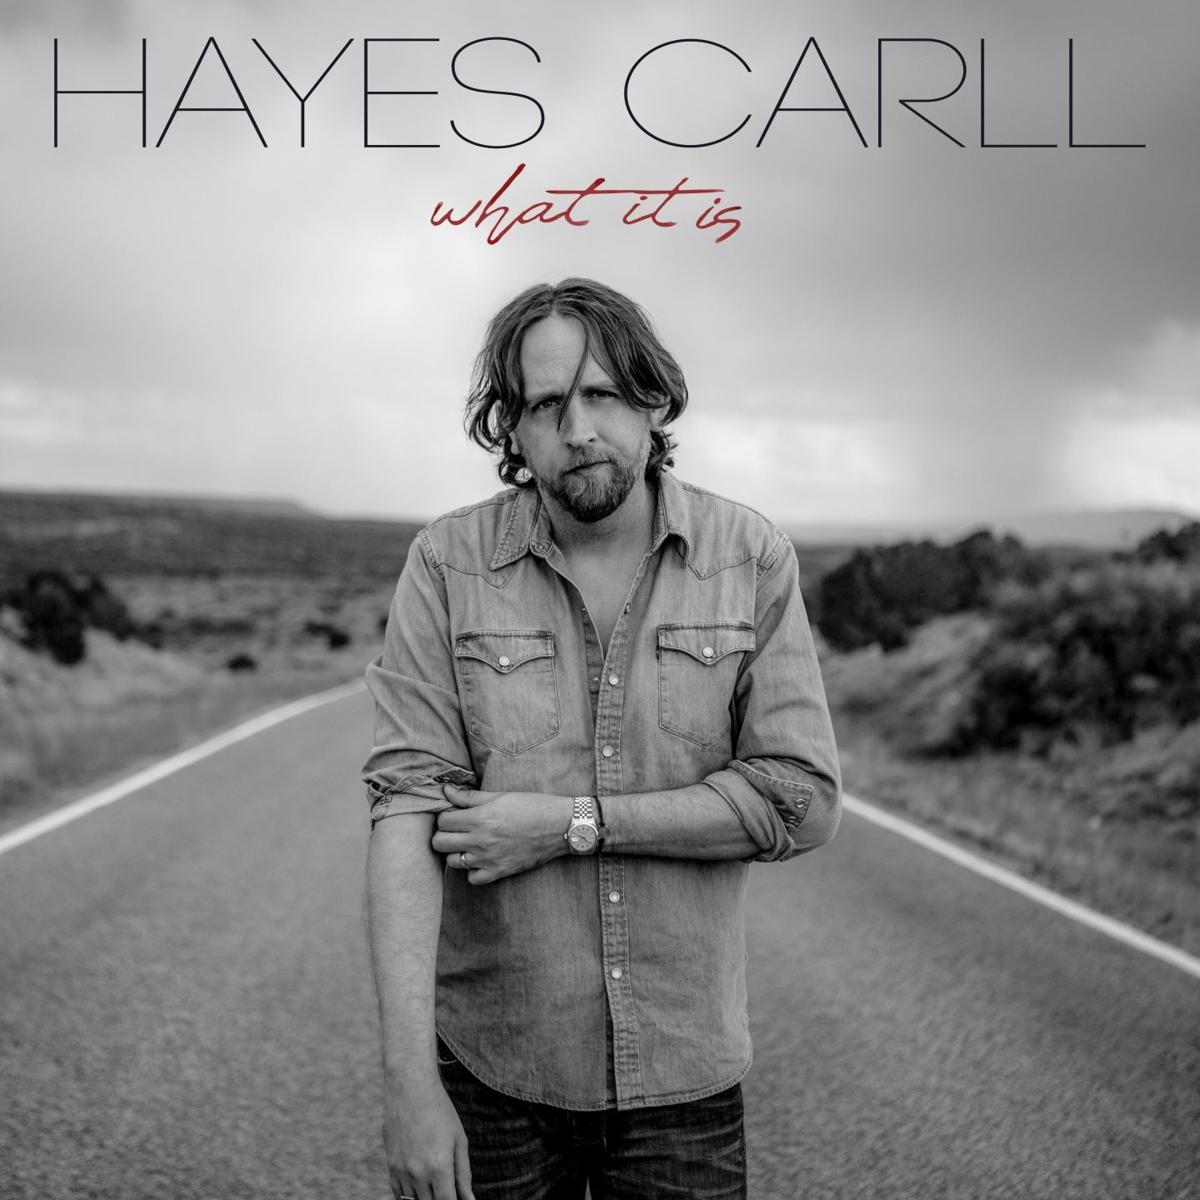 Hayes Carll